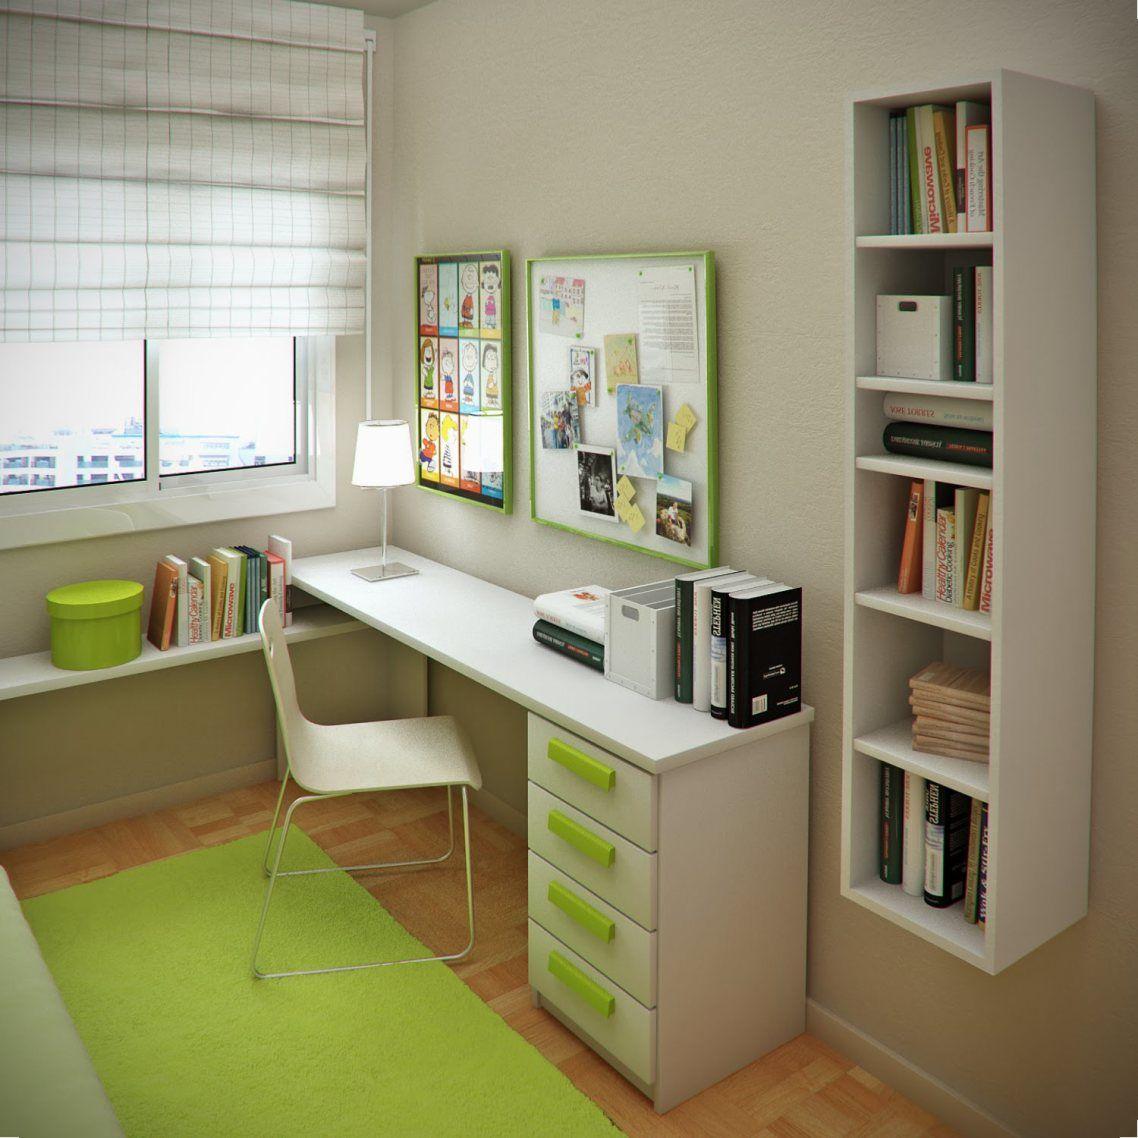 Beautiful White Brown Wood Grey Glass Modern Design Small Spaces Ideas Bedrooms Study Room Windows Flo Espacos Pequenos Decoracao De Quarto Ideias De Decoracao